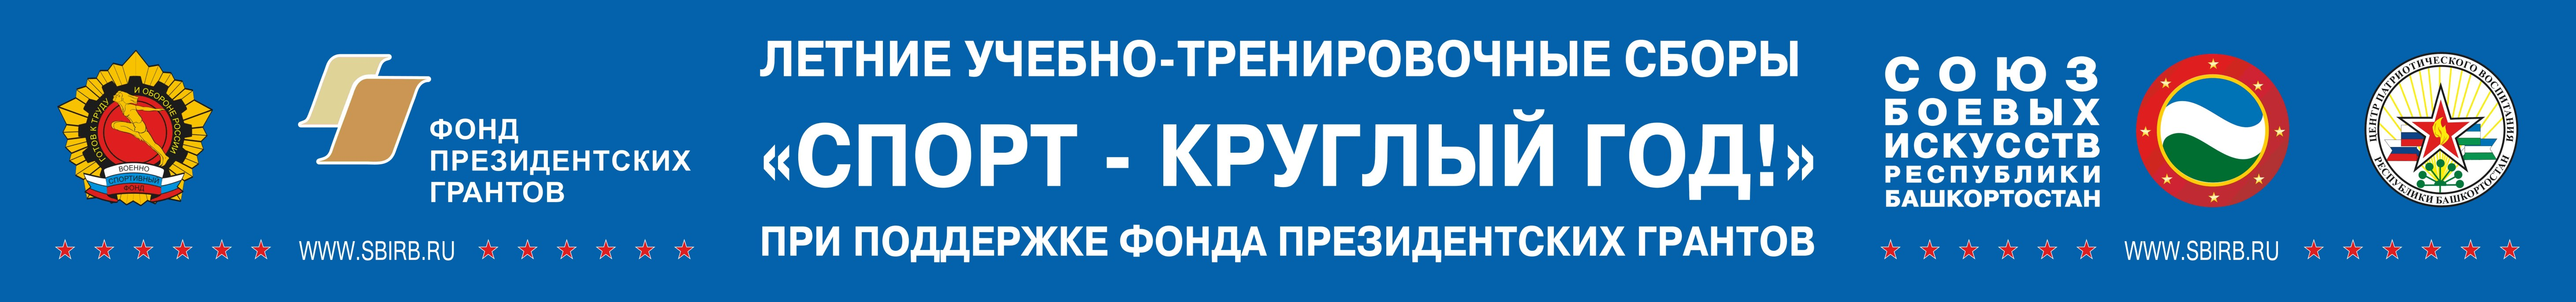 http://sbirb.combatsd.ru/images/upload/сборы%20-%20баннер.jpg